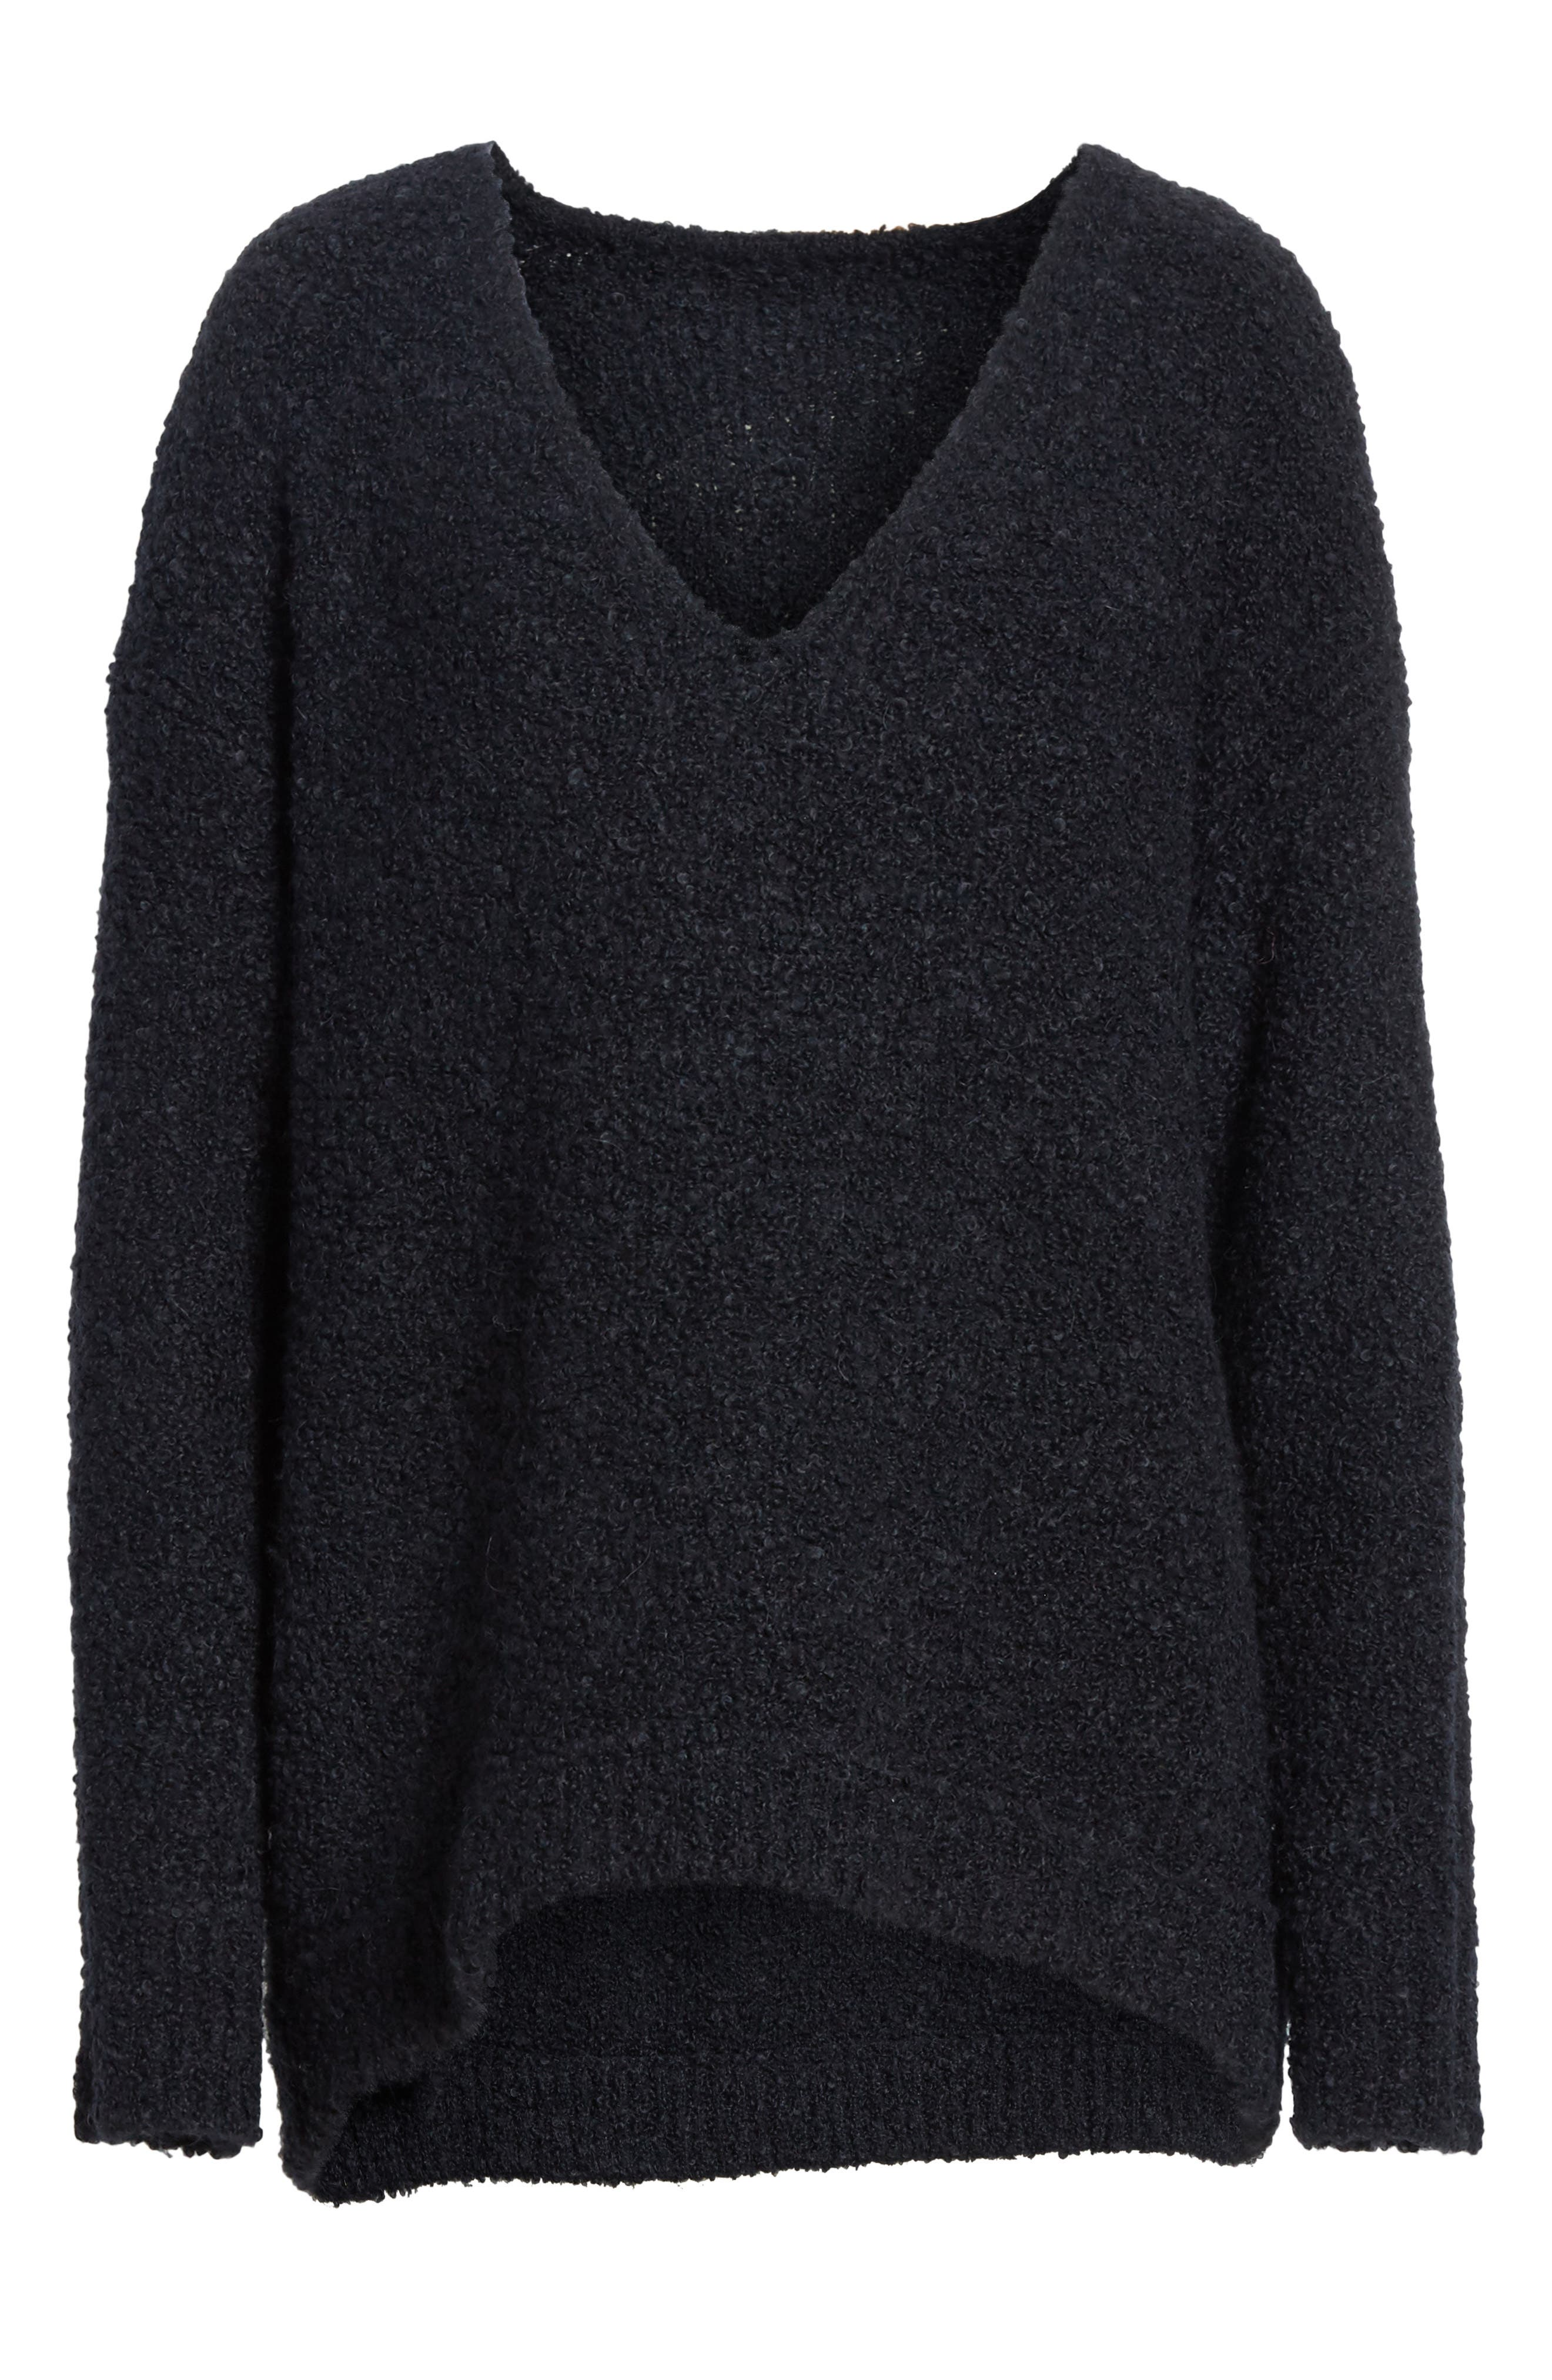 Lofty V-Neck Sweater,                             Alternate thumbnail 6, color,                             001